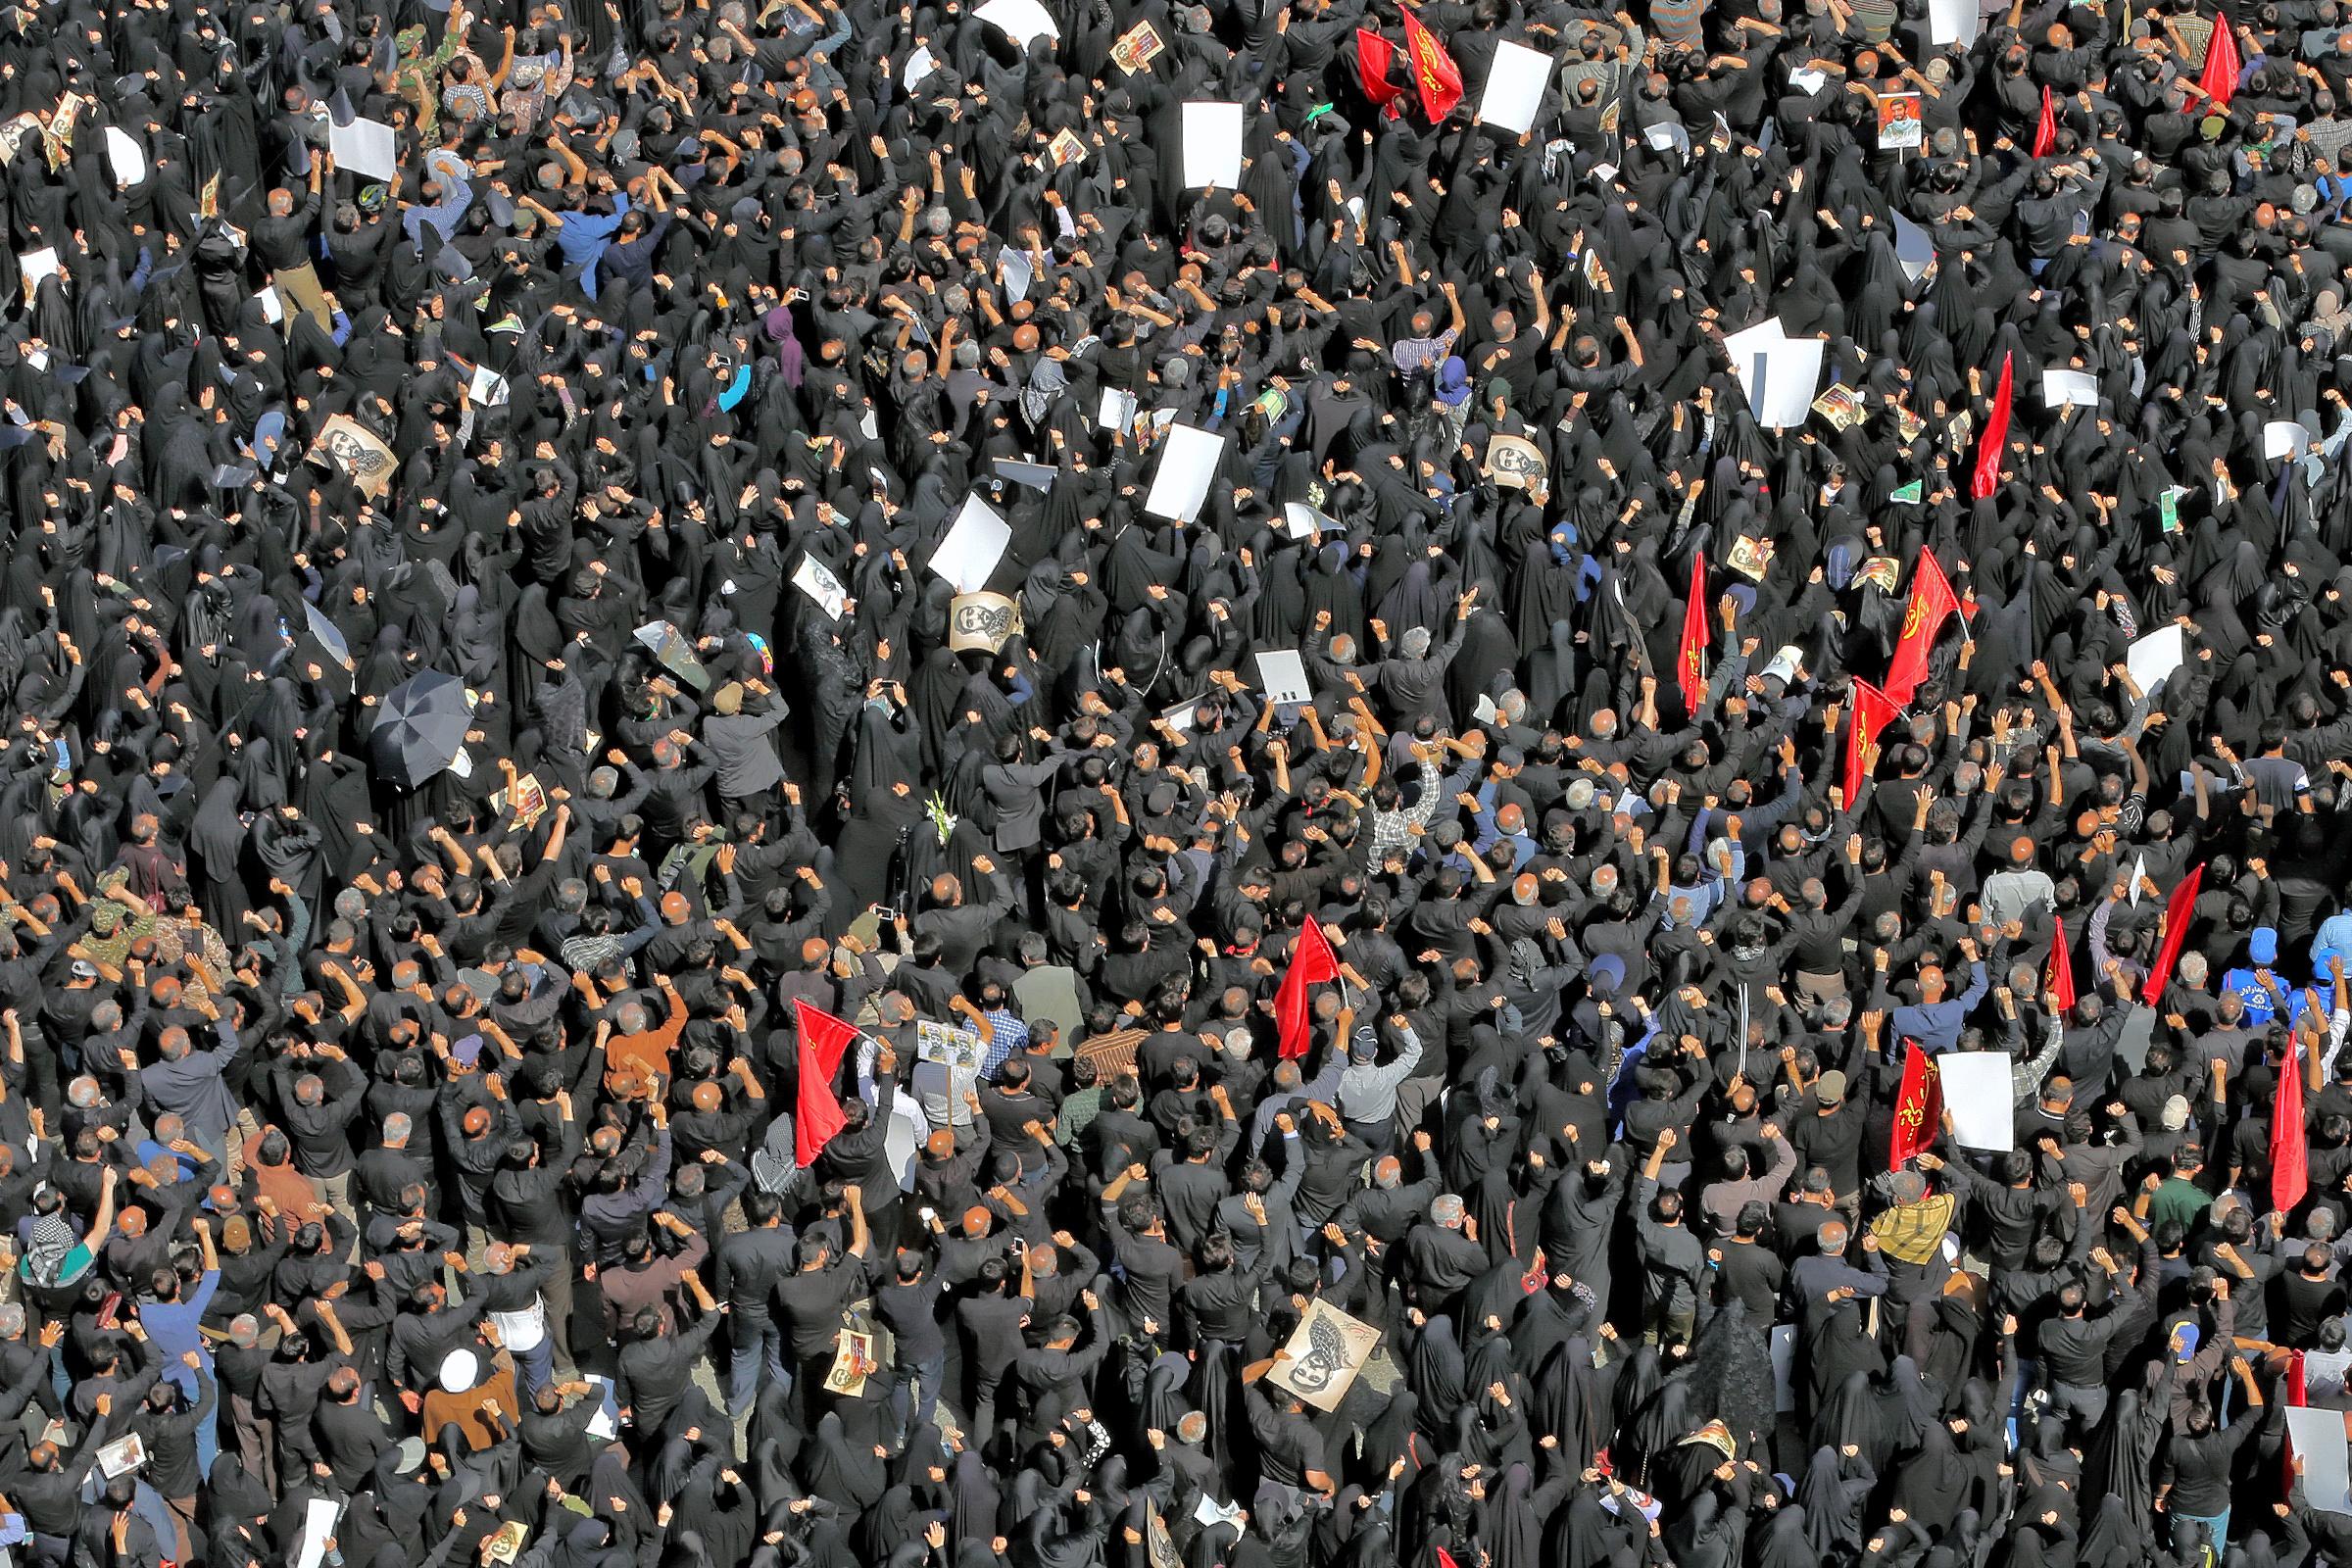 https://upload.wikimedia.org/wikipedia/commons/3/3b/Funeral_of_Mohsen_Hojaji_in_Tehran_037.jpg